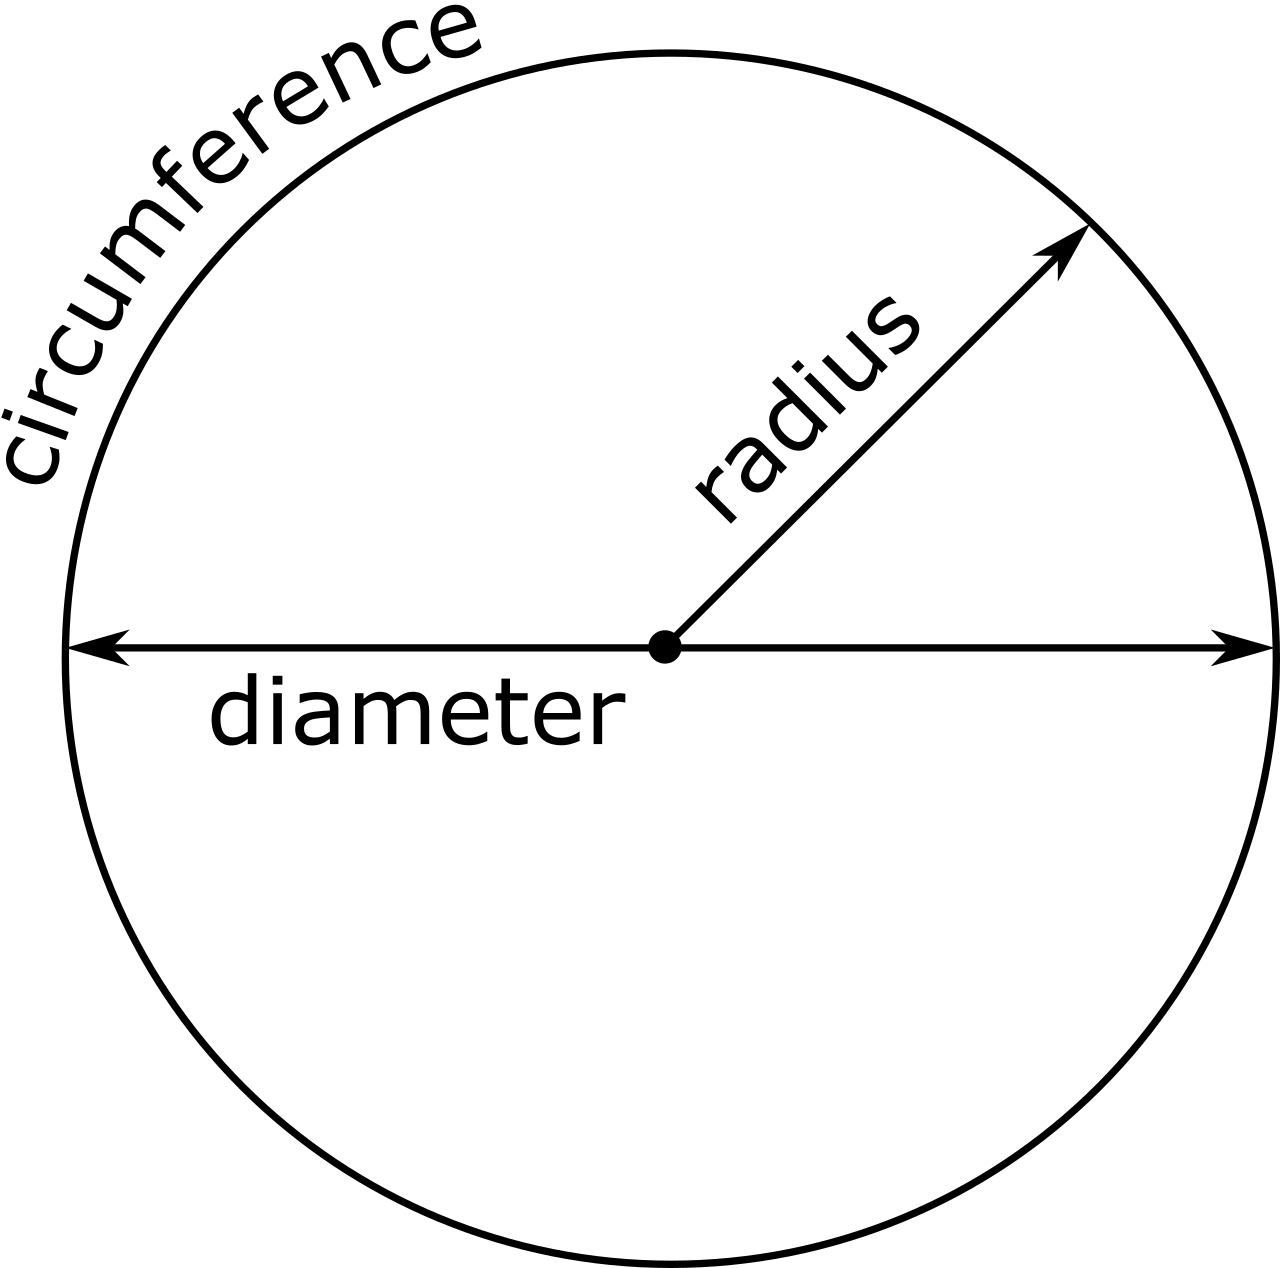 Circle Calculator - Find Radius, Circumference, & Area - Inch Calculator